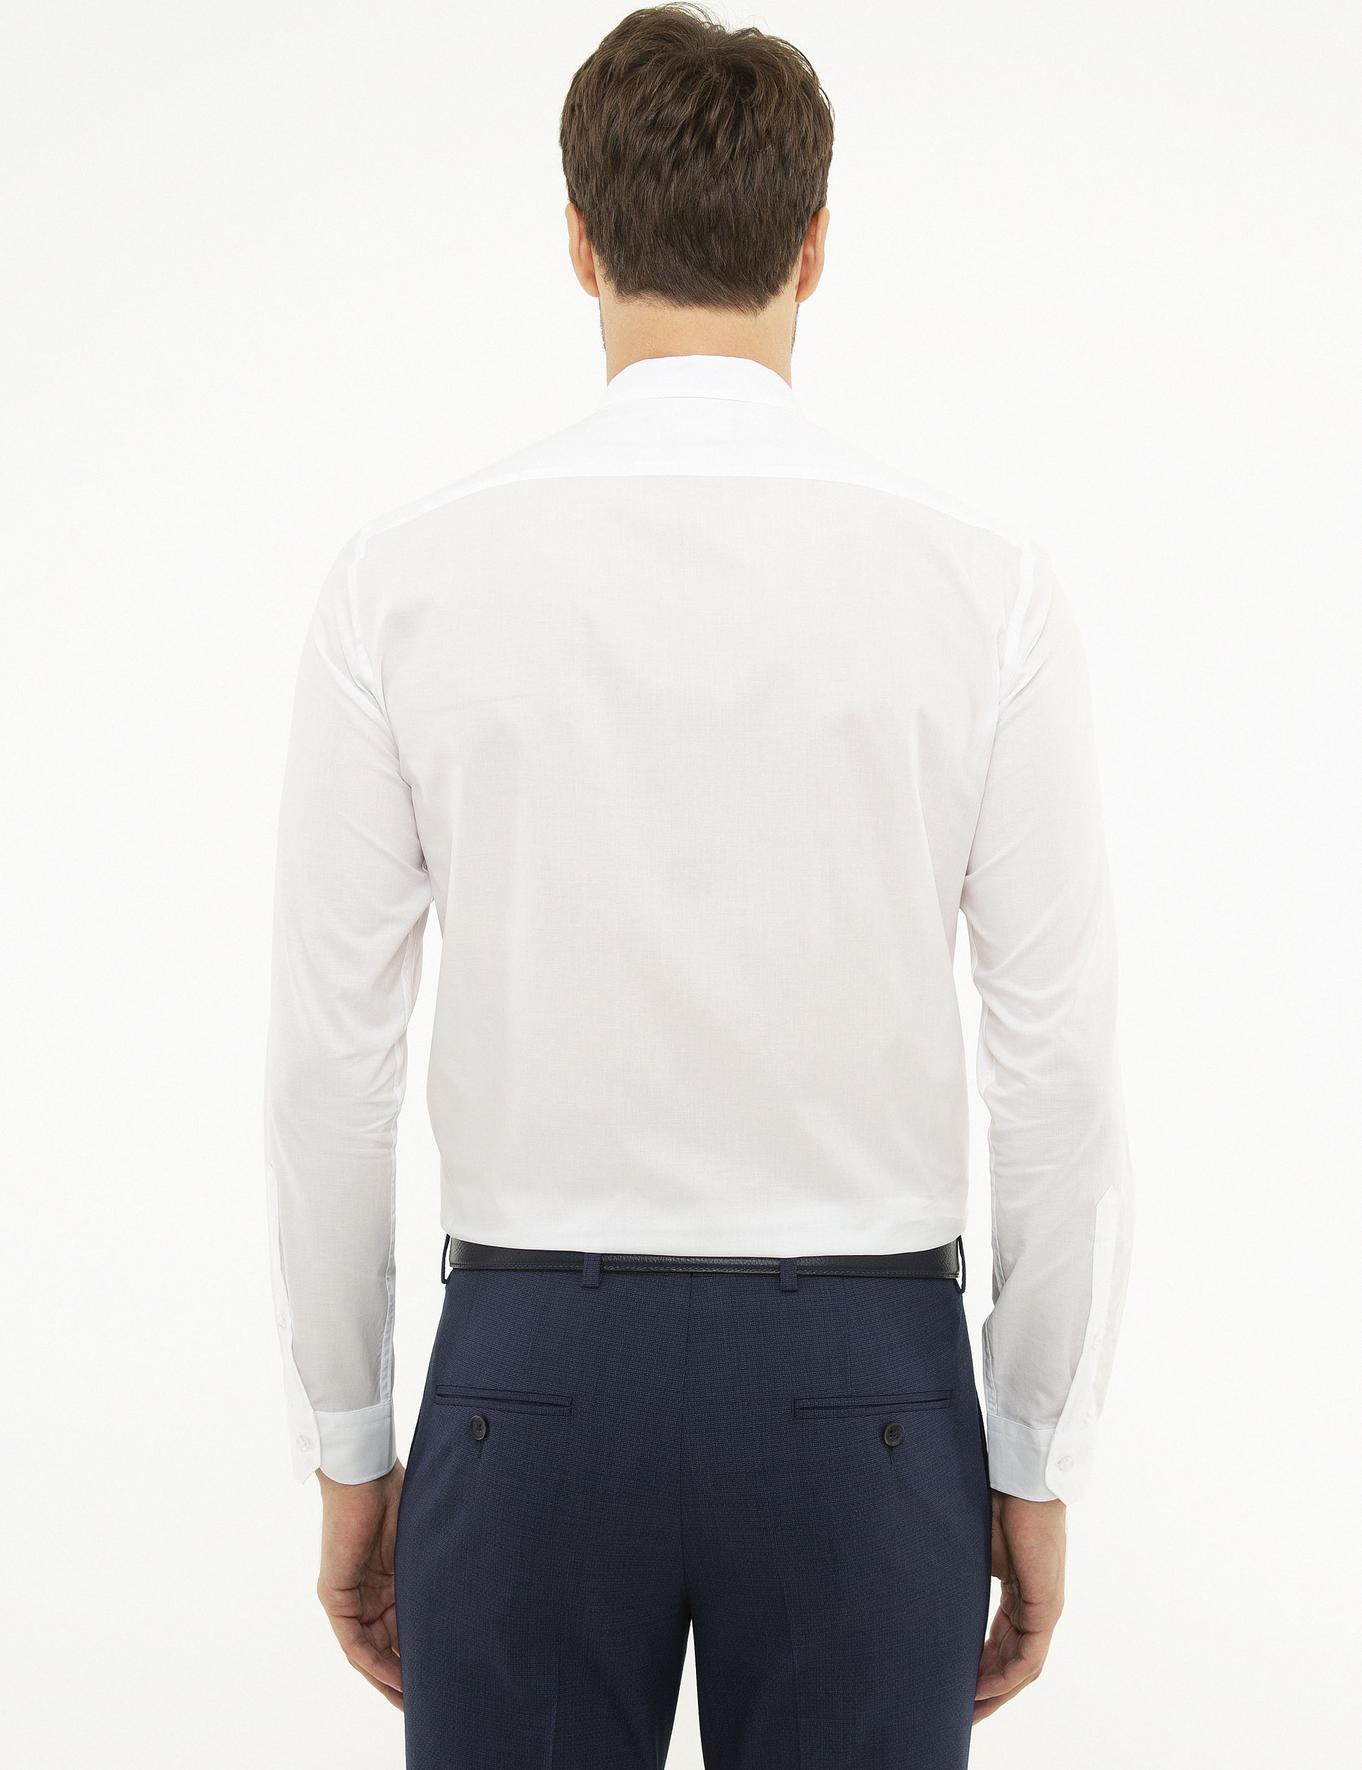 Beyaz Slim Fit Gömlek - 50219052006